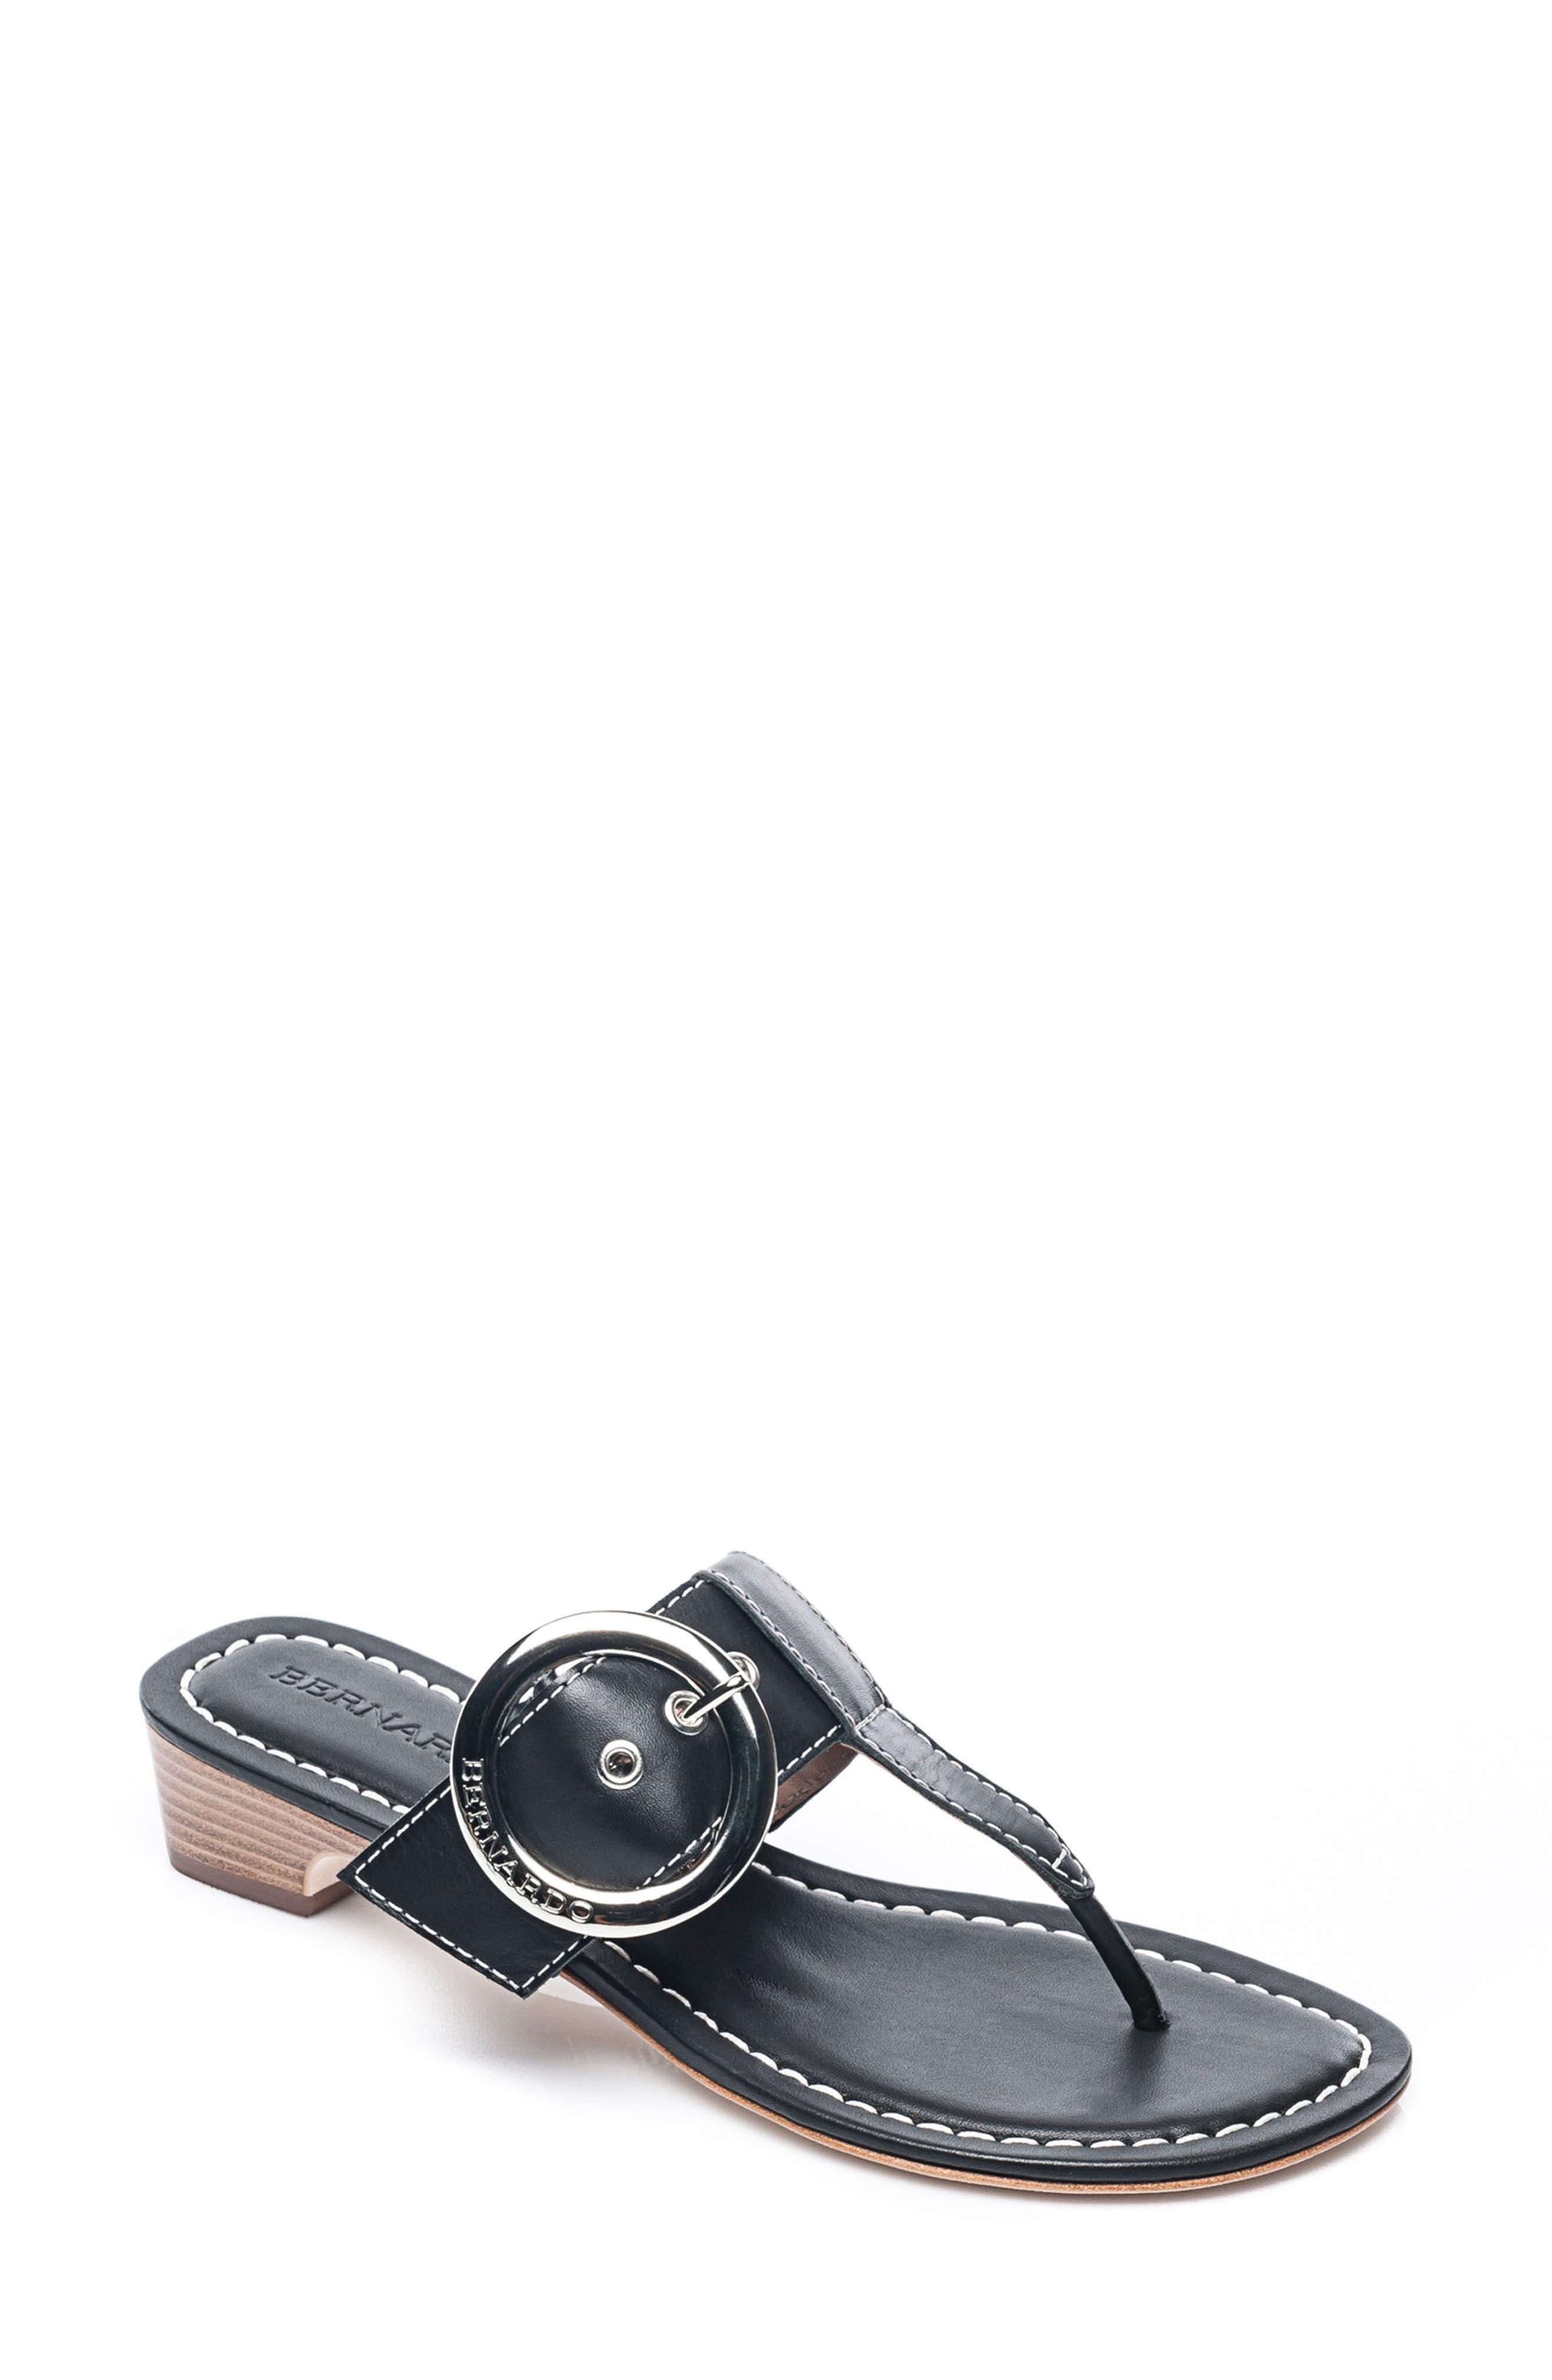 Bernardo Grace Sandal,                         Main,                         color, Black Leather